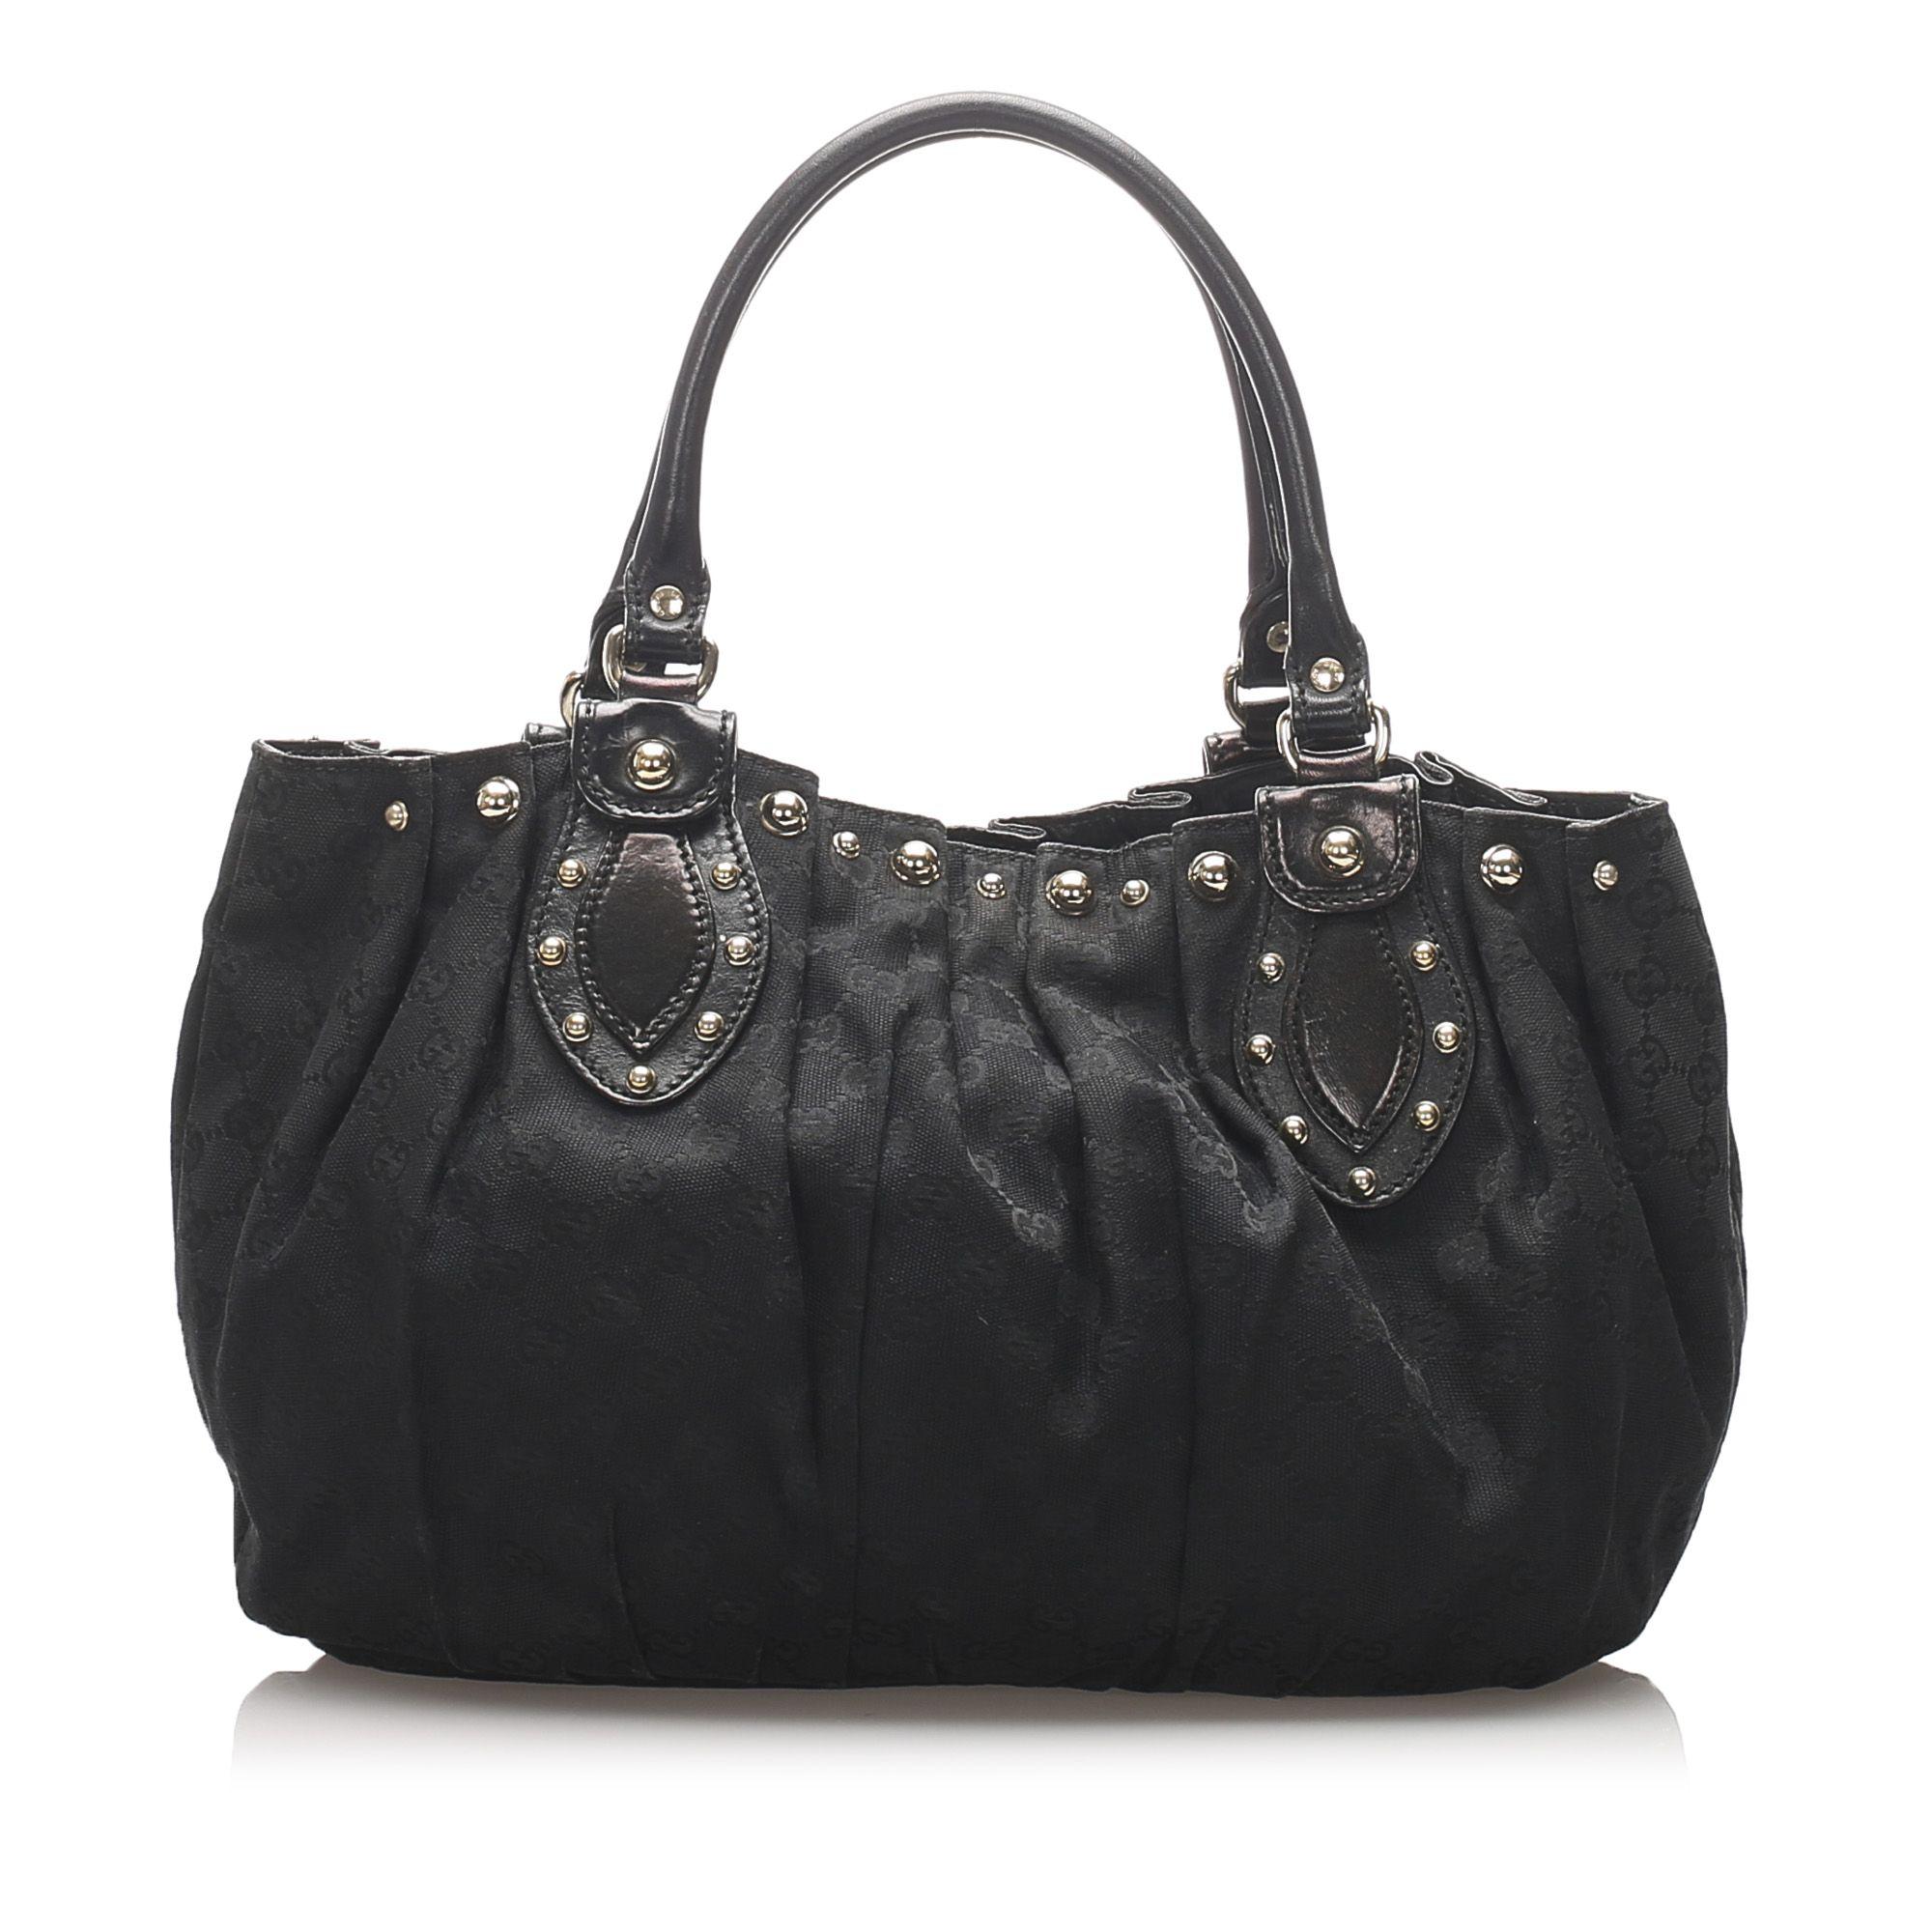 Vintage Gucci GG Canvas Pelham Bag Black